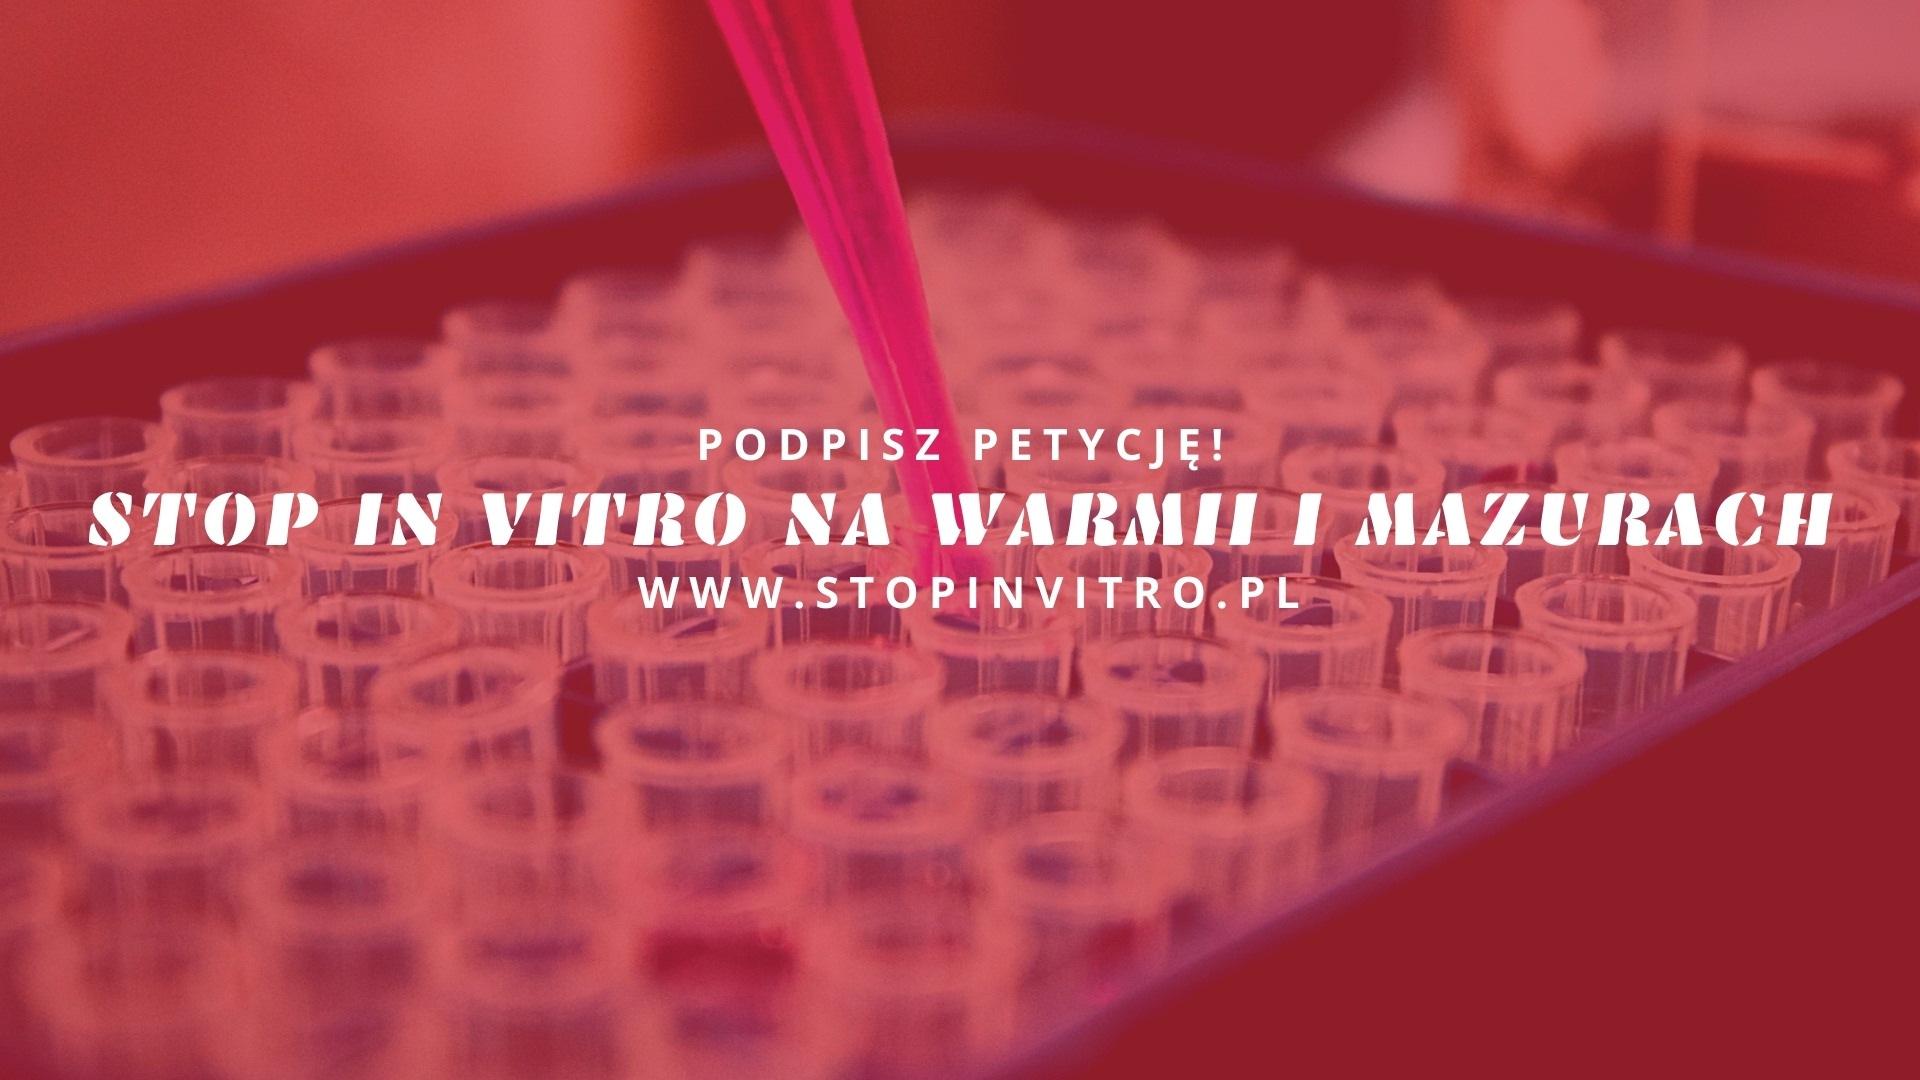 stop in vitro na warmii i mazurach